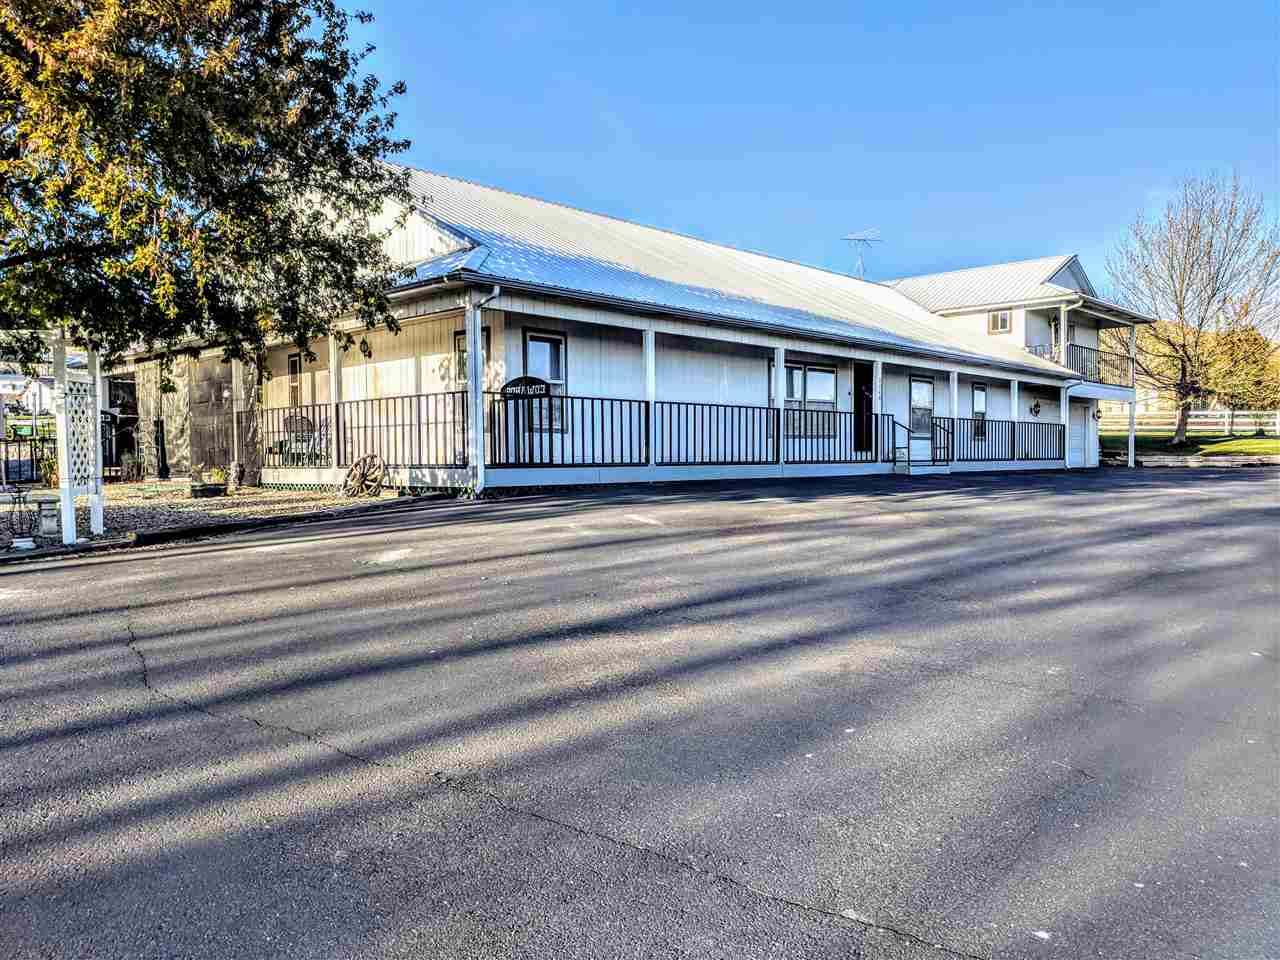 Edificio Residencial por un Venta en 2140 NE. 10th Avenue 2140 NE. 10th Avenue Payette, Idaho 83661